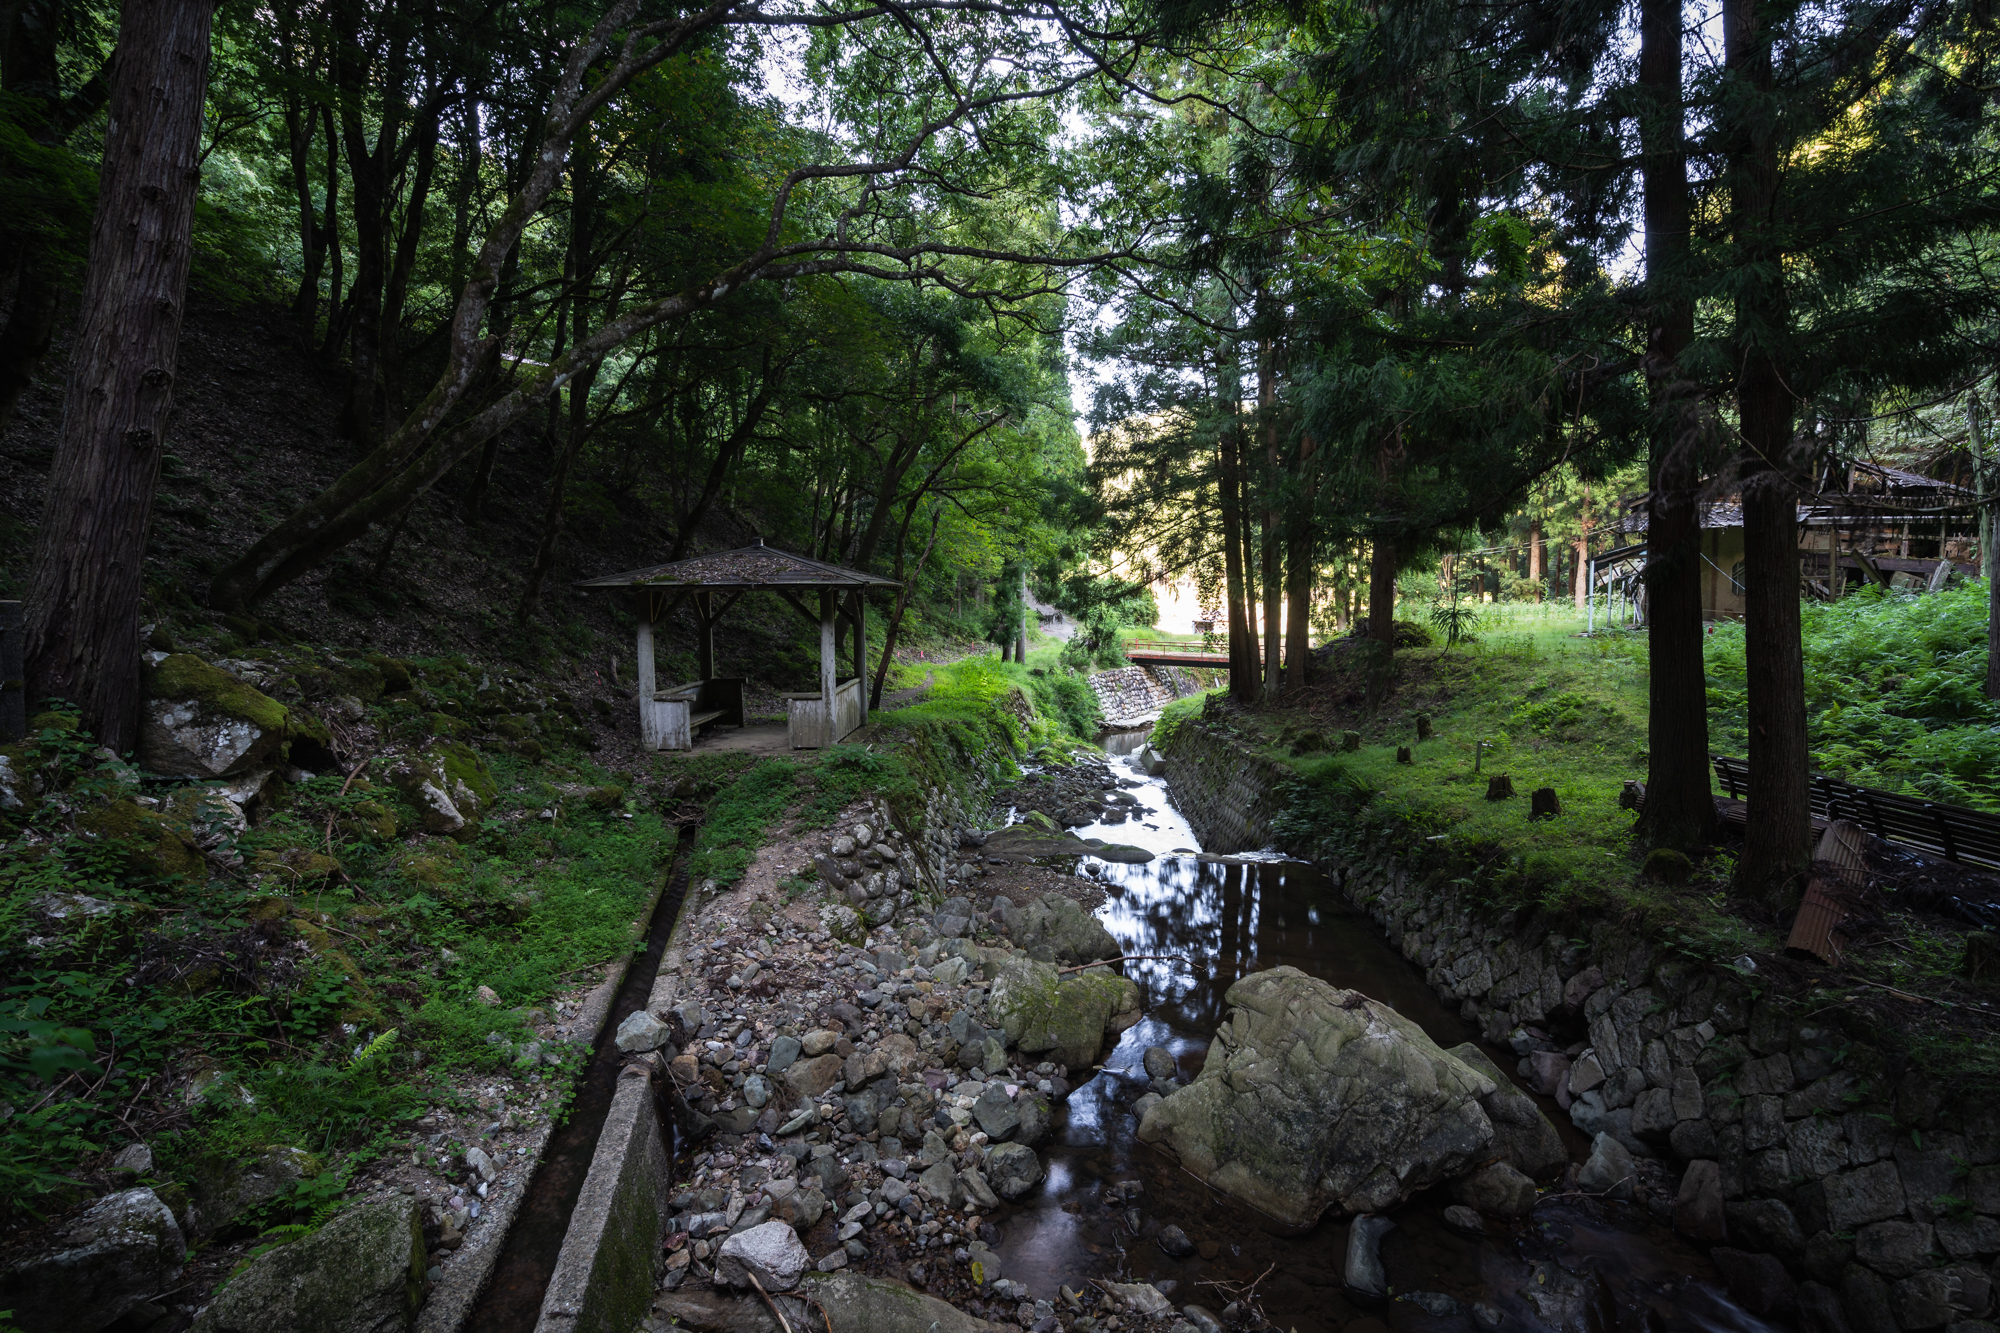 DSC01641 兵庫県   清竜の滝 ( 駐車場から歩いて5分! 関西・近畿・兵庫県の滝スポット! アクセス情報や撮影ポイントなど!)